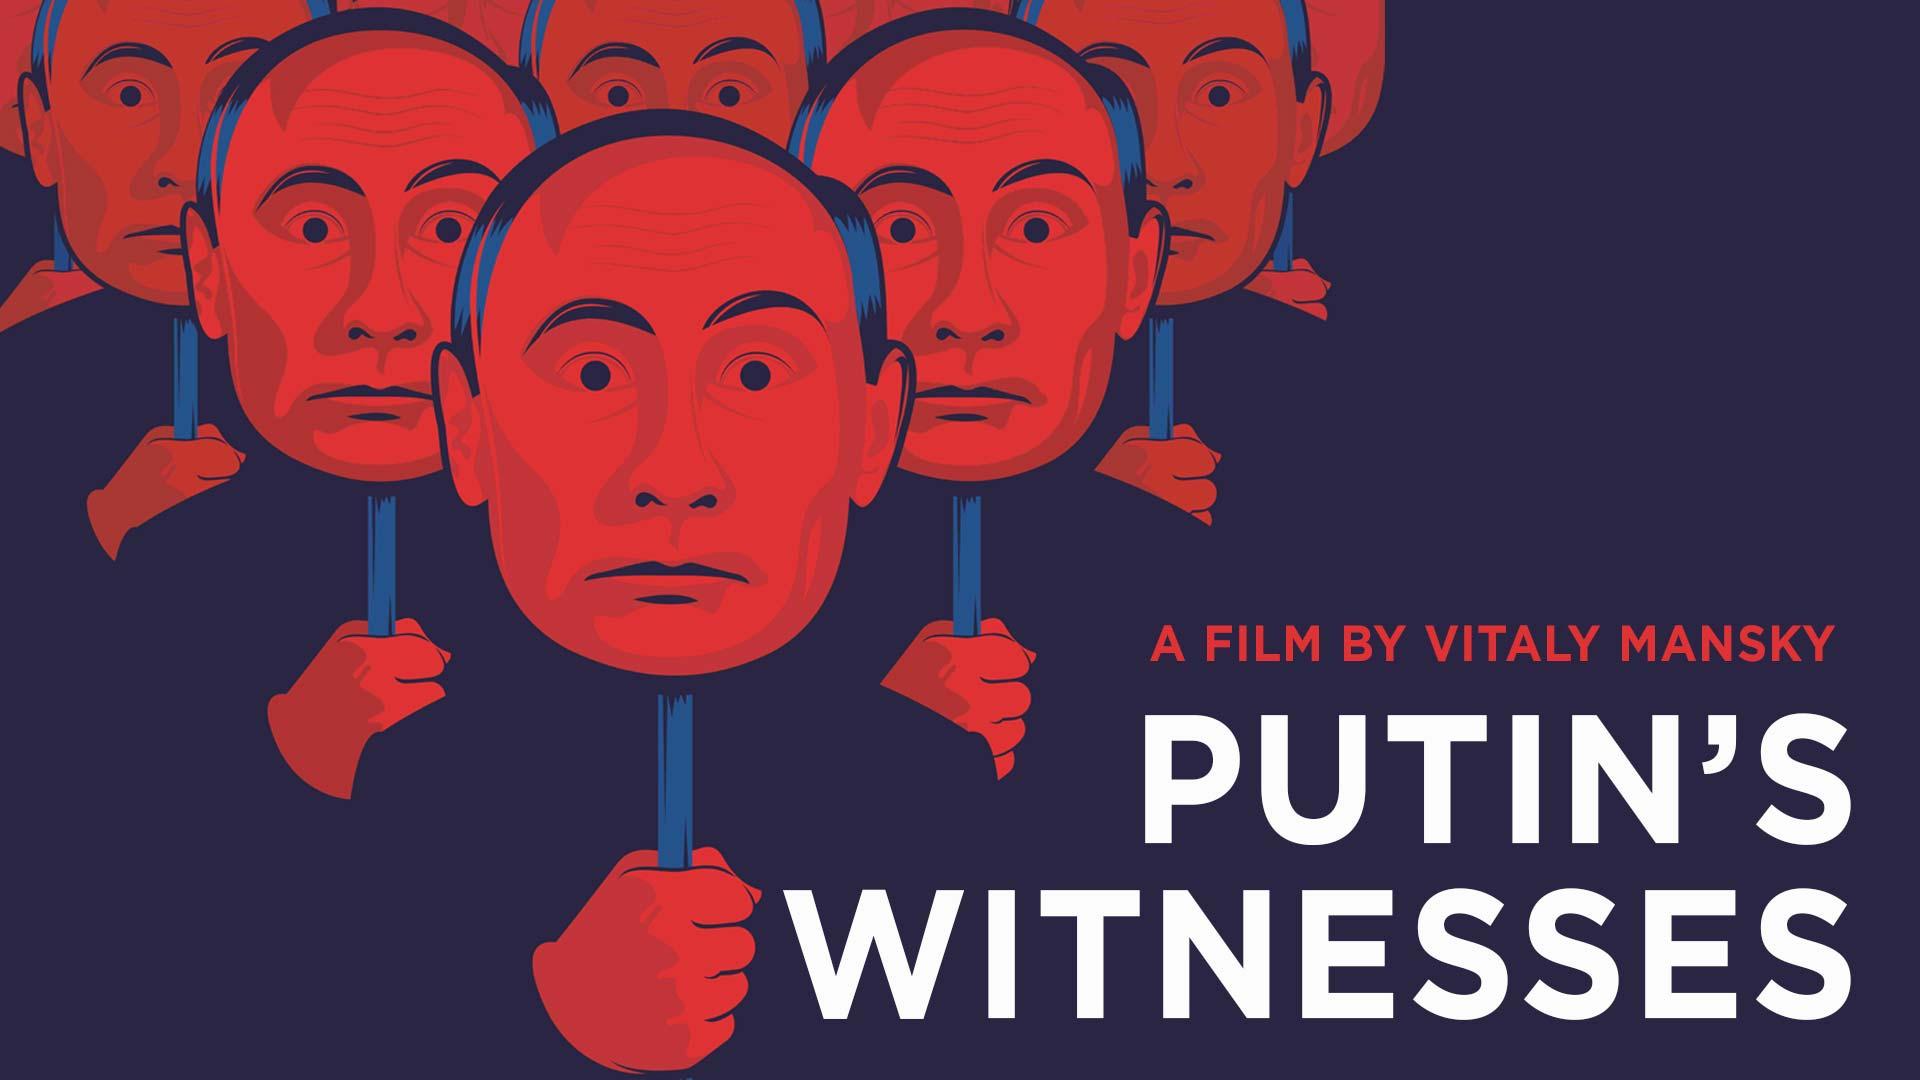 Putin's Witnesses - image